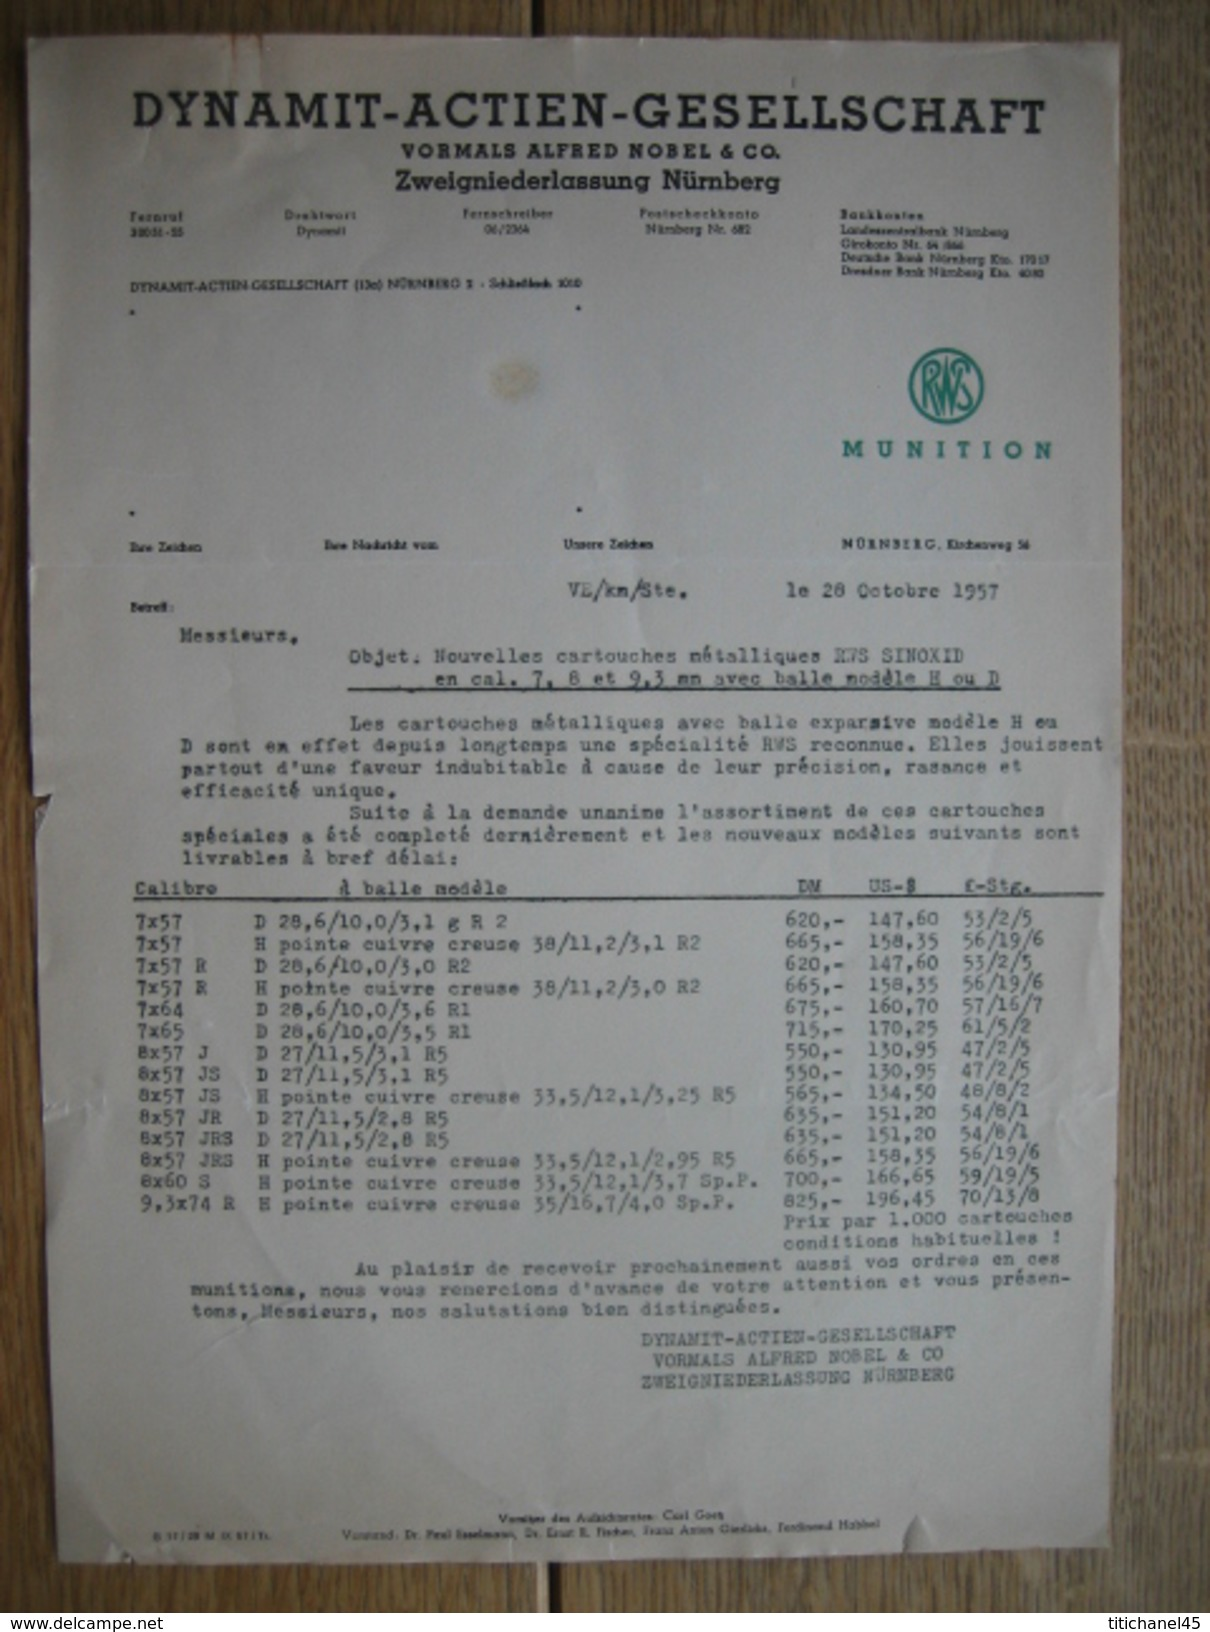 NÜRNBERG 1957 - DYNAMIT-ACTIEN-GESELLSCHAFT Vormals Alfred Nobel & C° - Tarif Cartouches De Chasse à Balle - 6 Pages - Allemagne